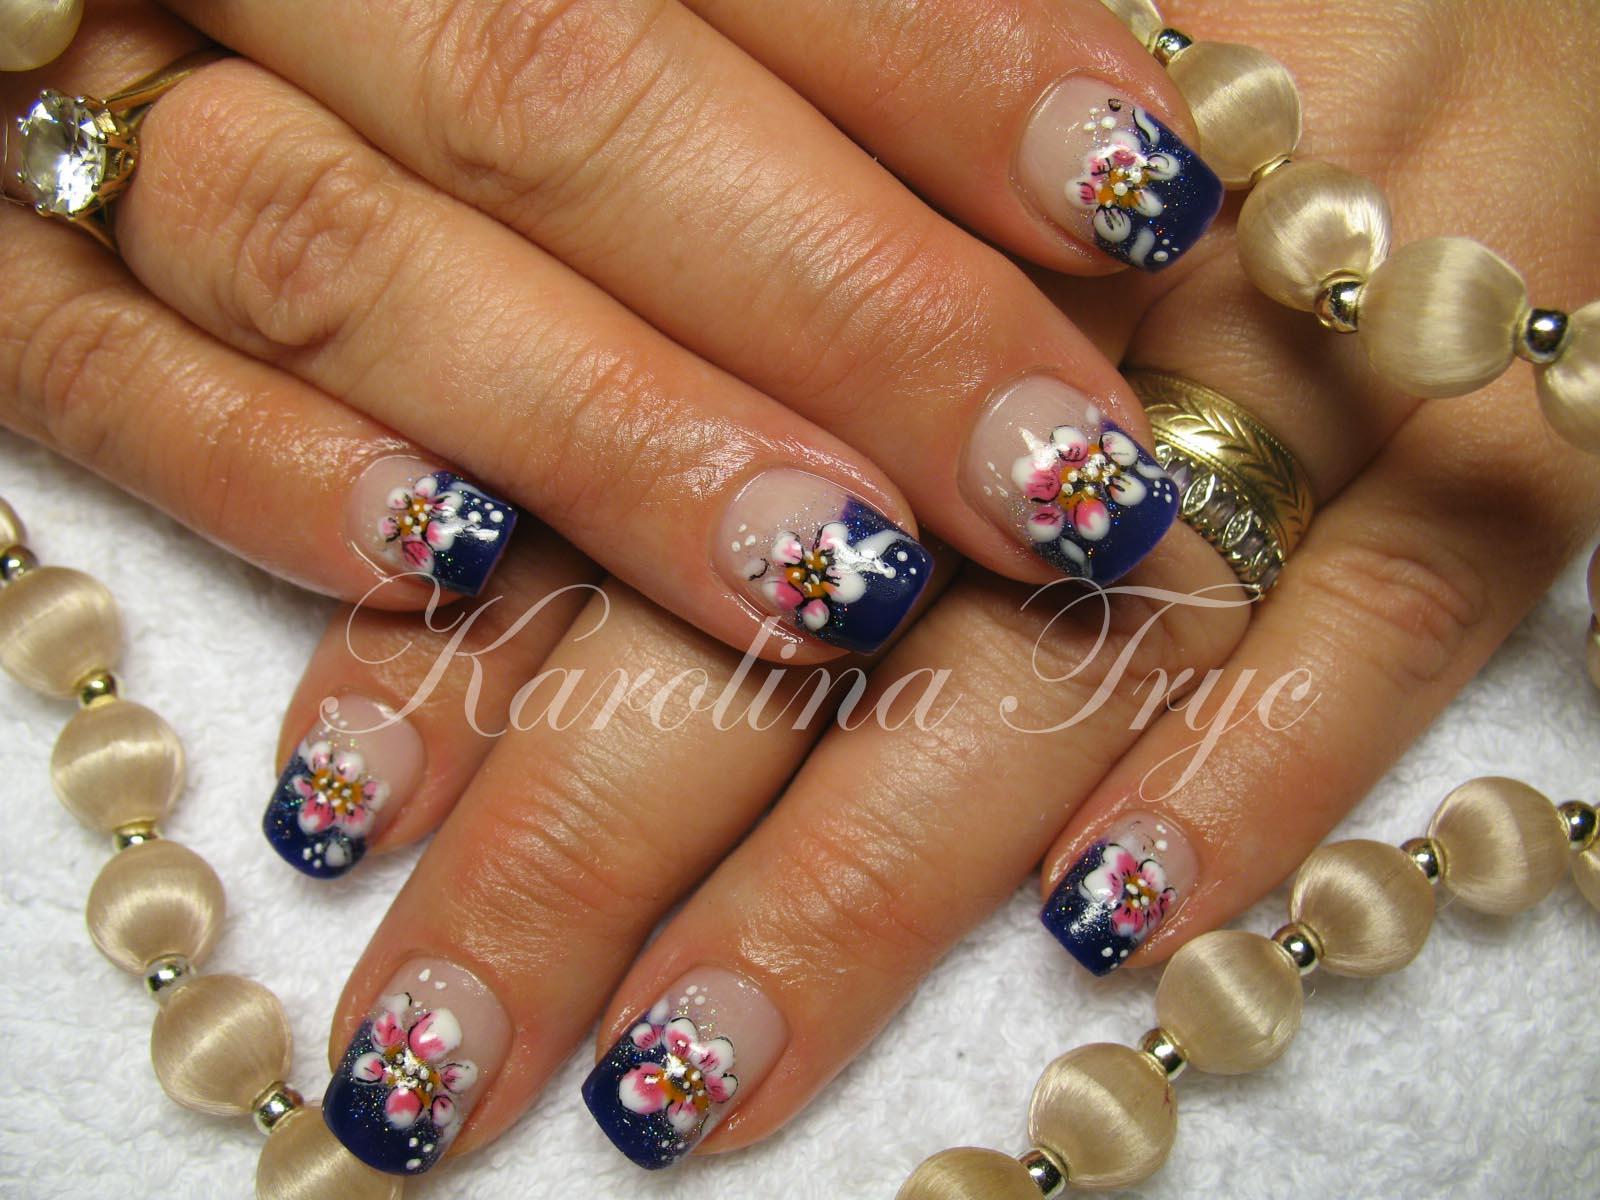 uv gel nails photo - 2